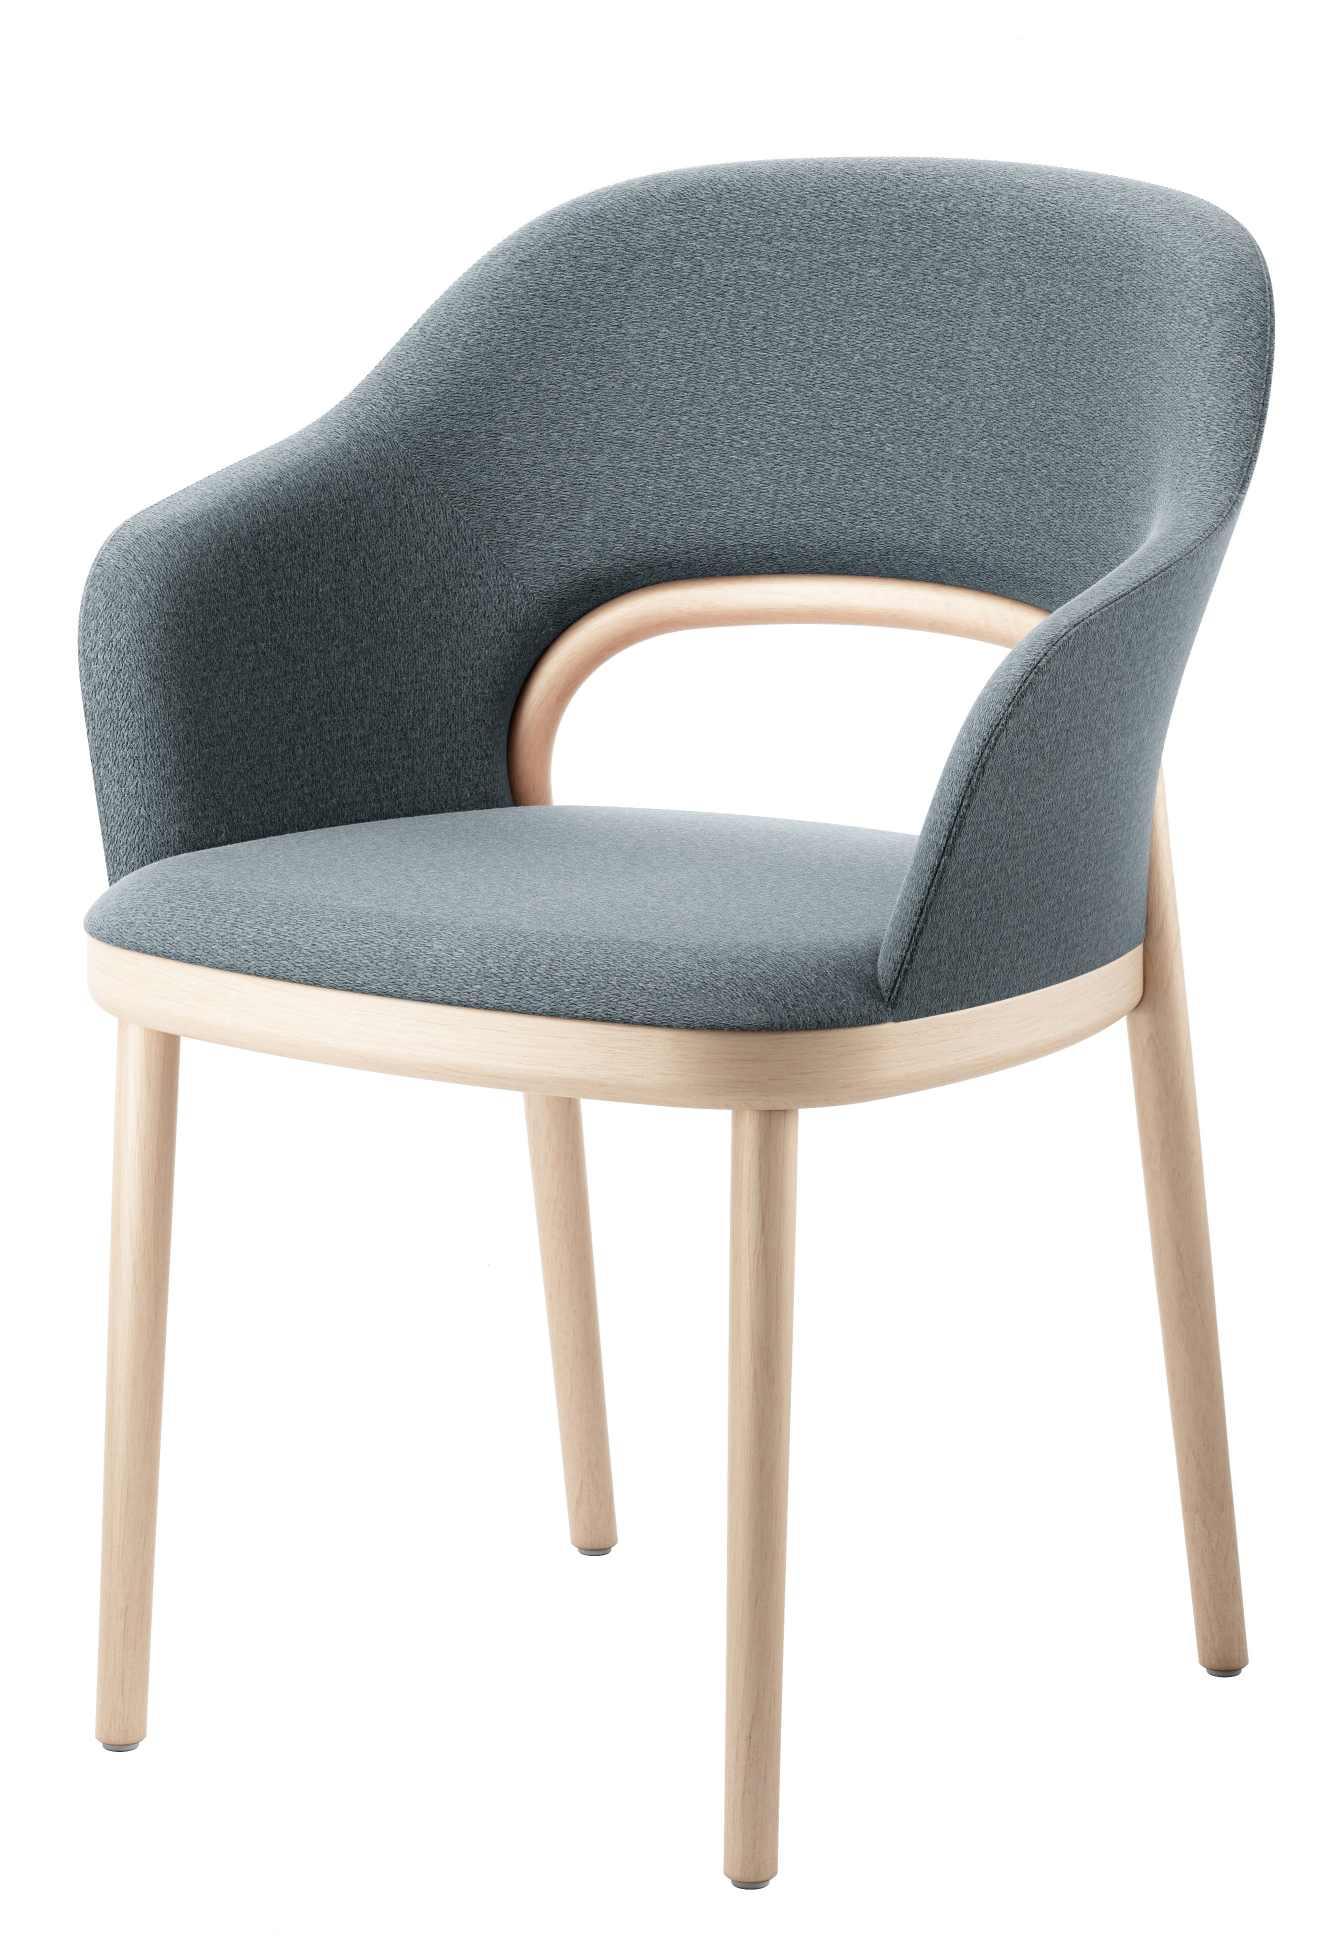 520 P Upholstered chair Thonet